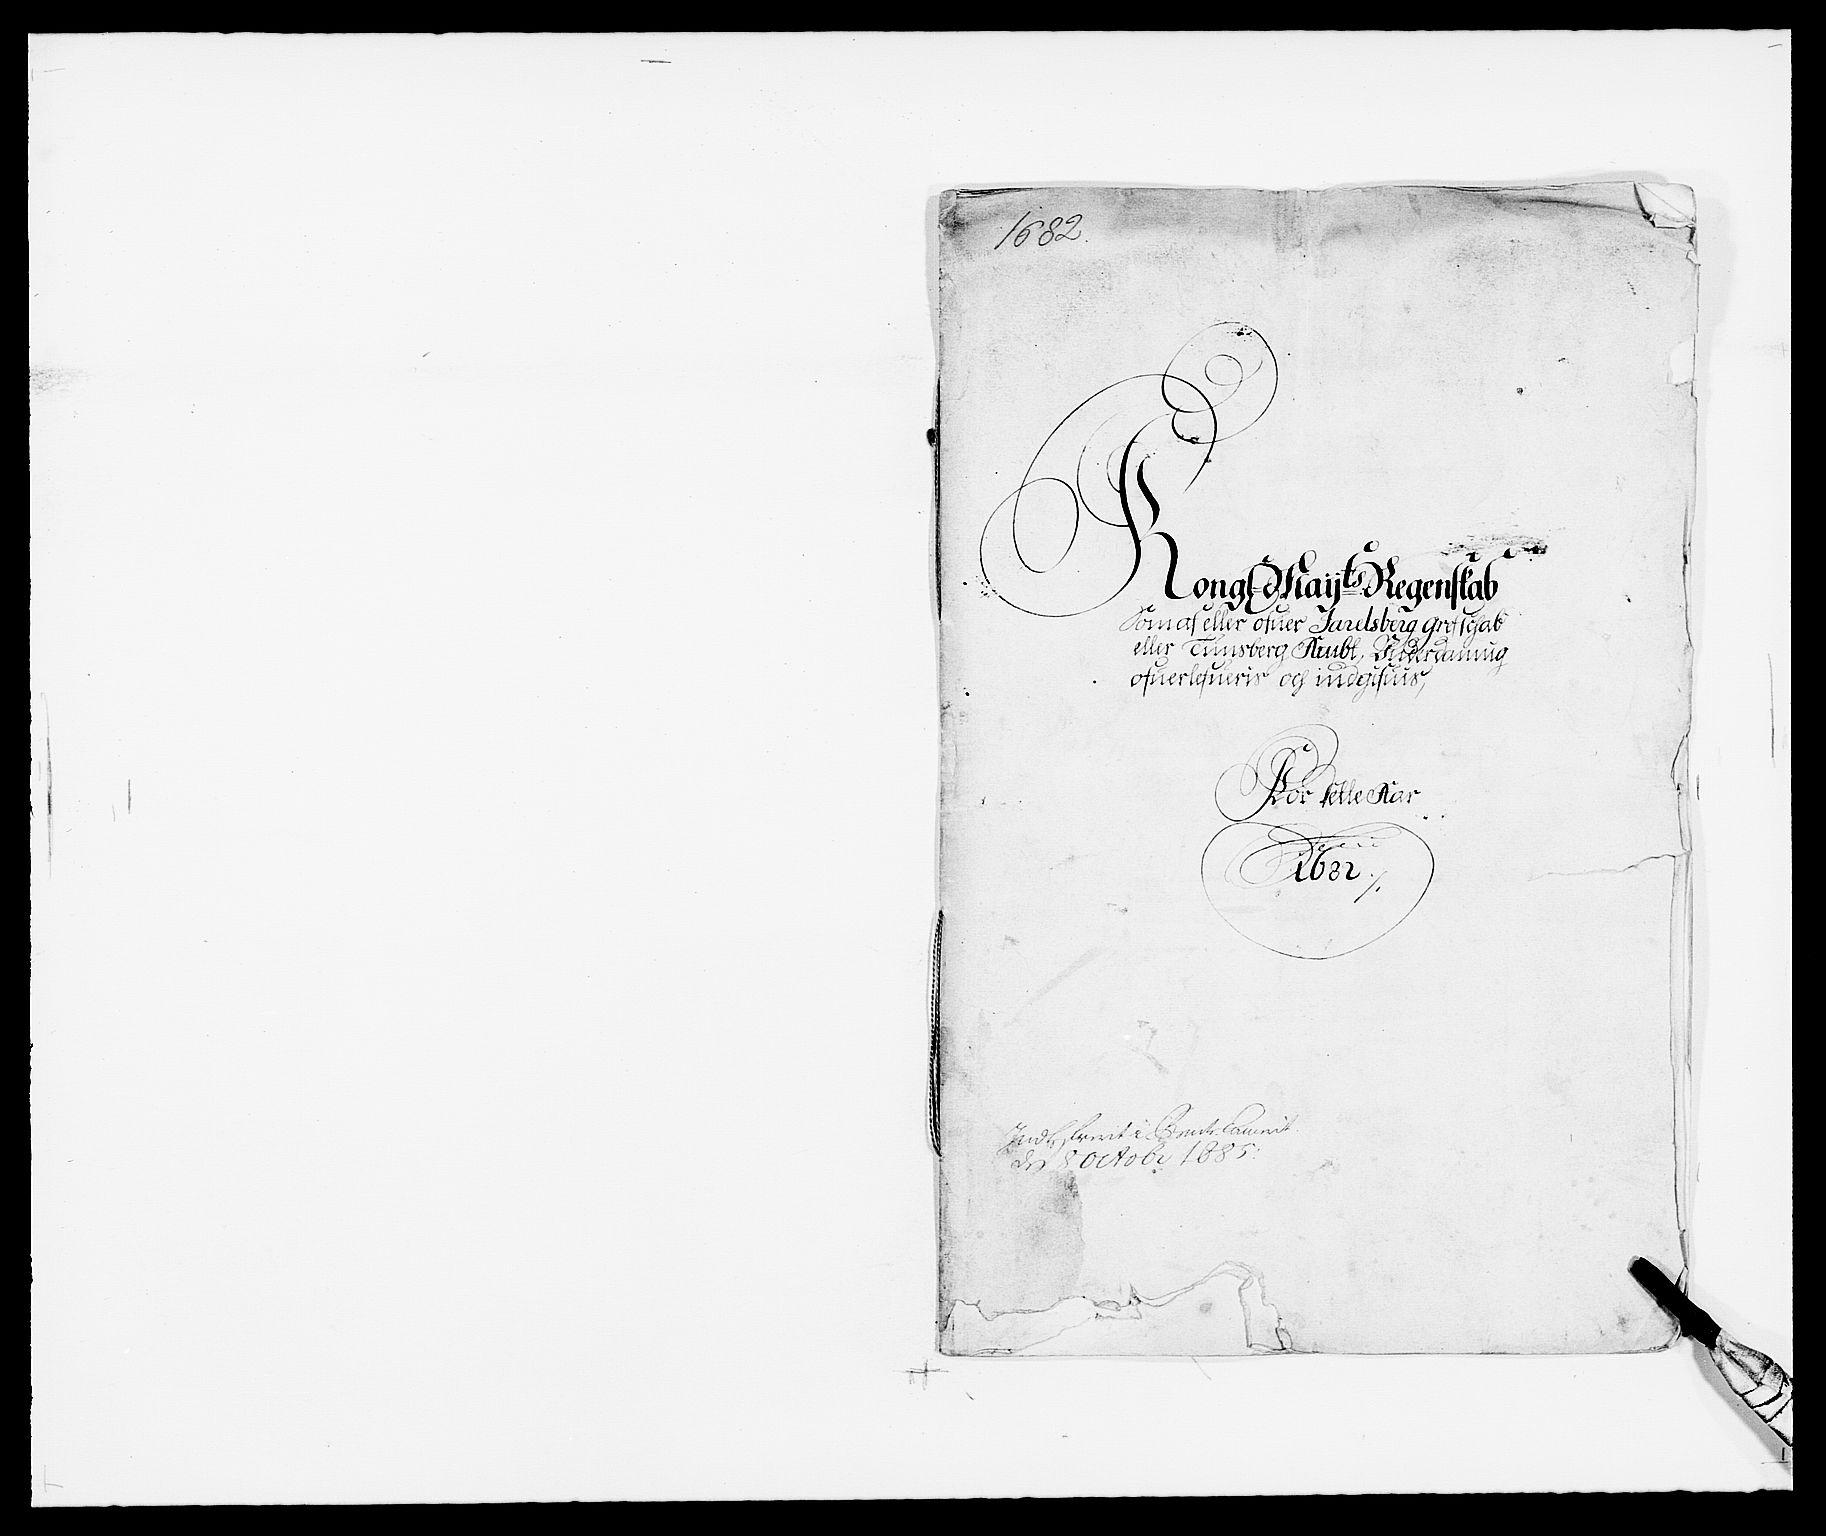 RA, Rentekammeret inntil 1814, Reviderte regnskaper, Fogderegnskap, R32/L1851: Fogderegnskap Jarlsberg grevskap, 1682, s. 1